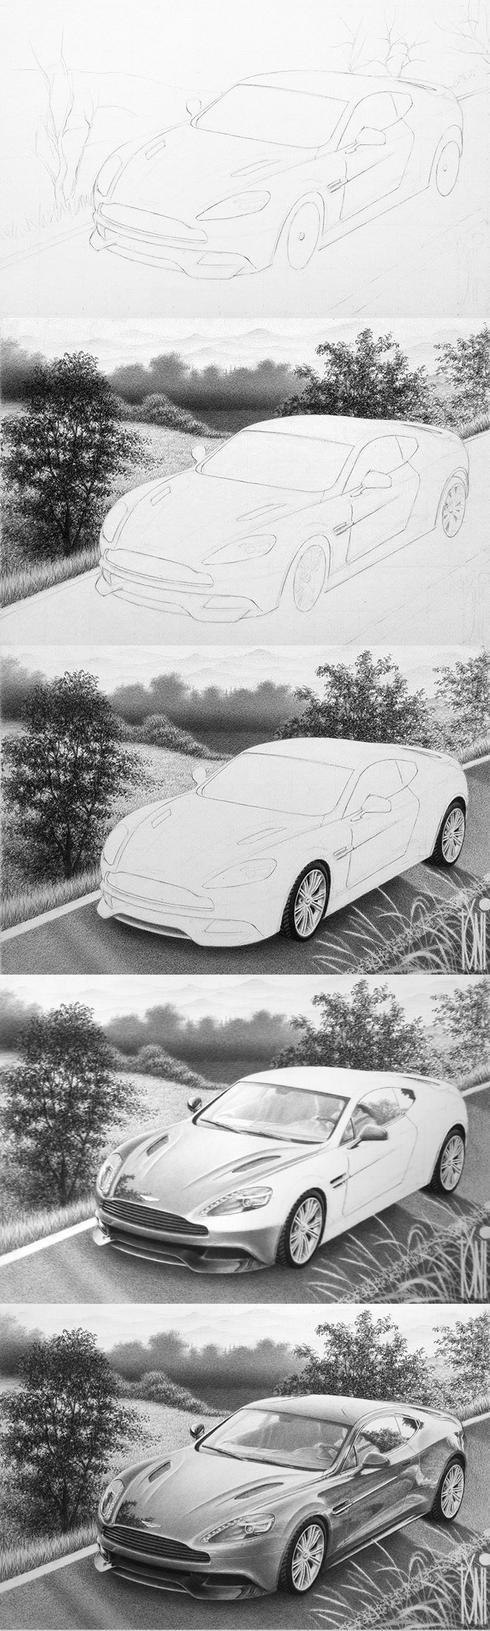 Aston Martin Vanquish W.I.P by toniart57